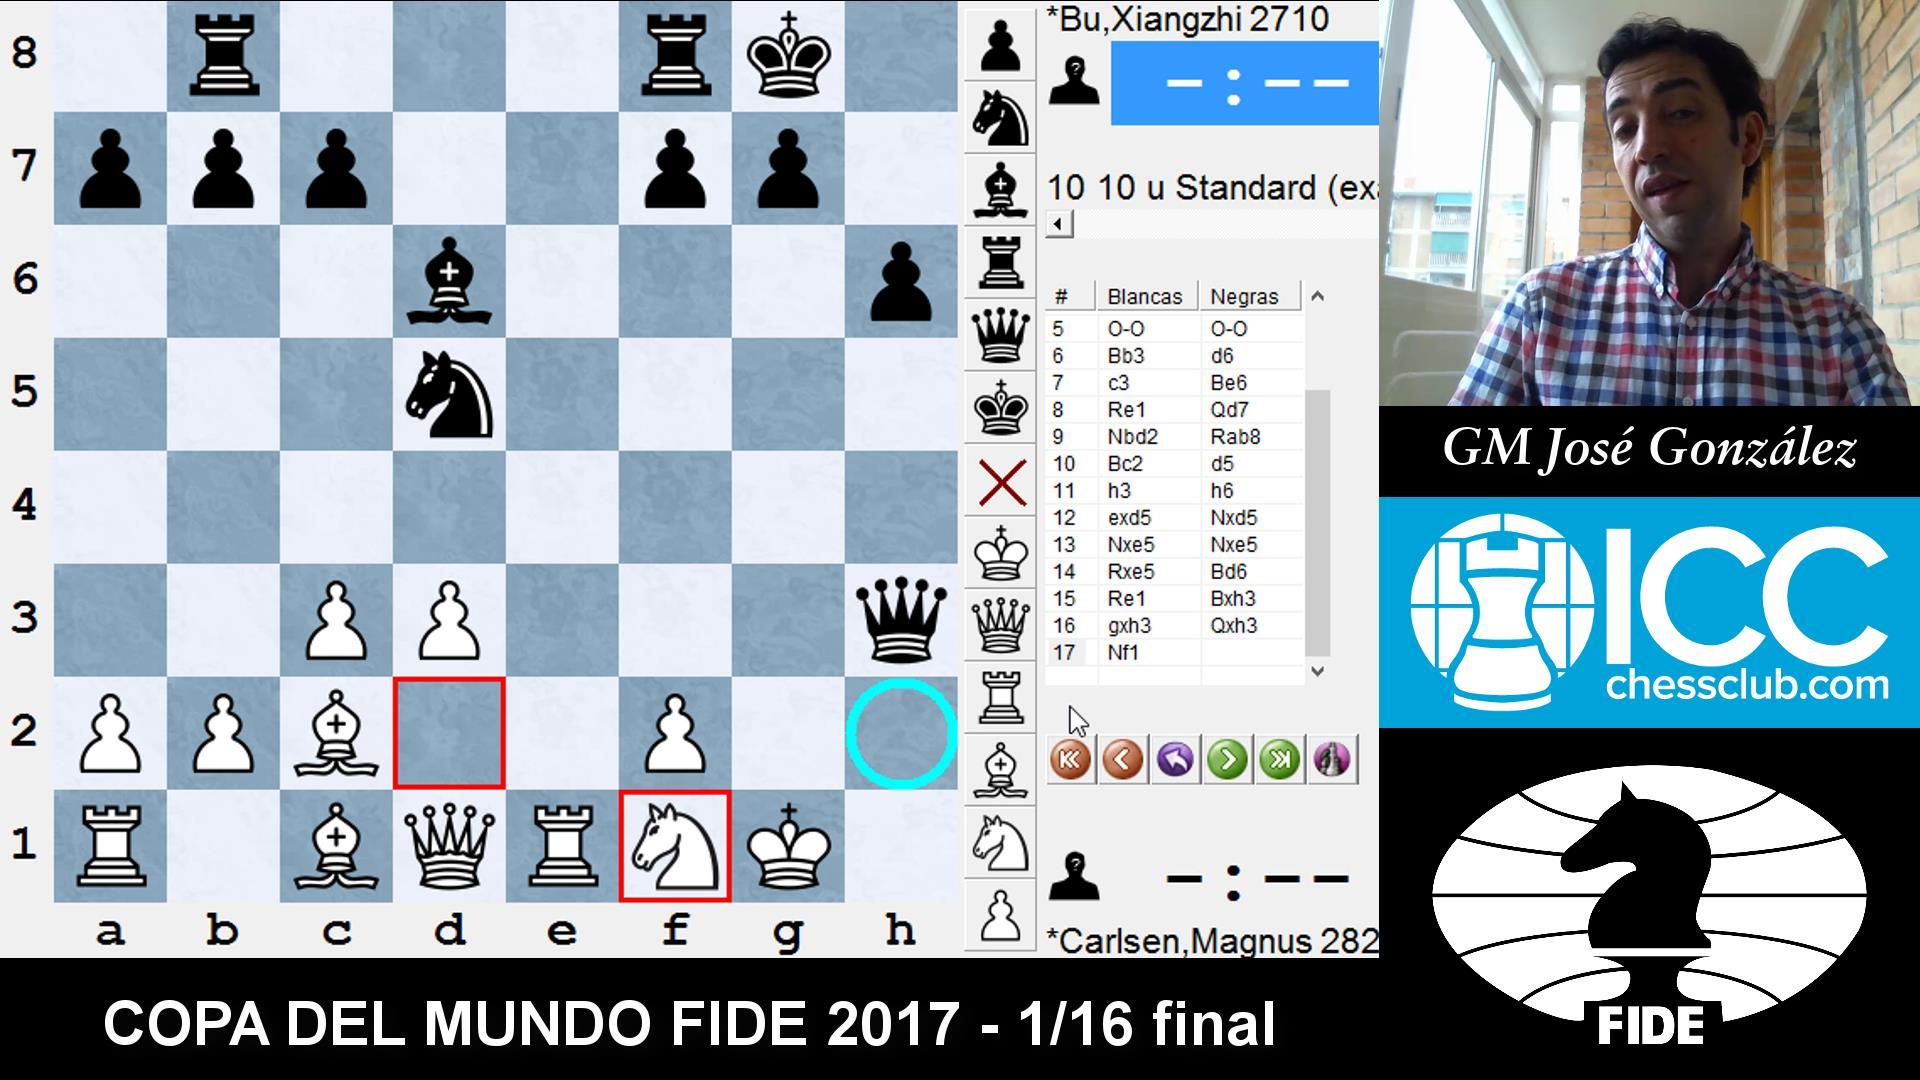 COPA DEL MUNDO FIDE 2017 - Resumen 1/16 final (GM José González)